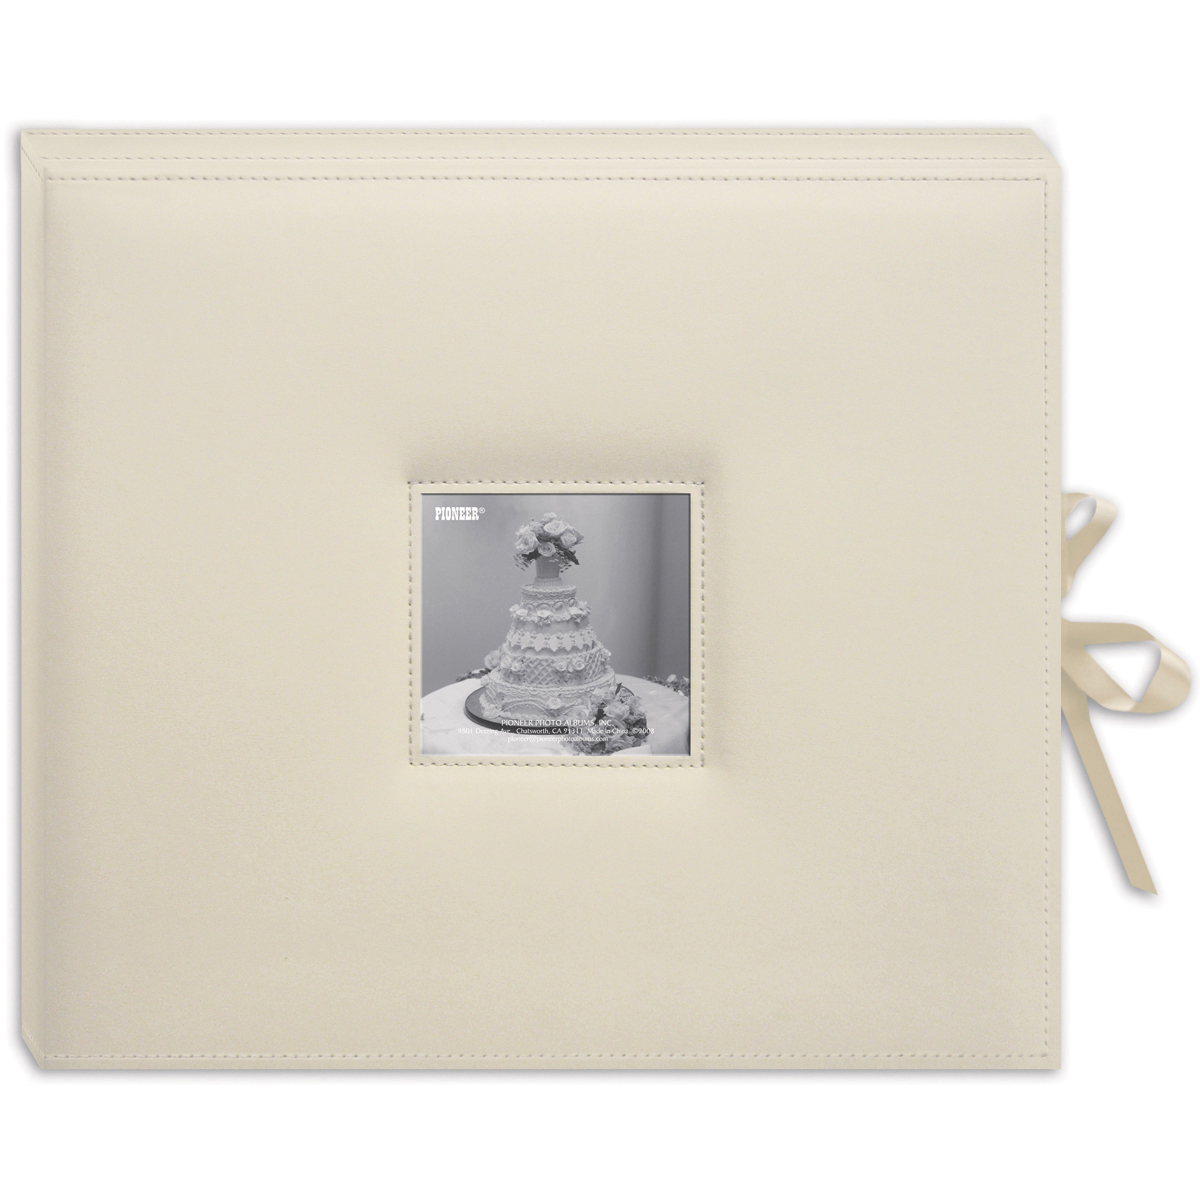 Pioneer 3-Ring Sewn Leatherette Album Box 13X14.5-Ivory